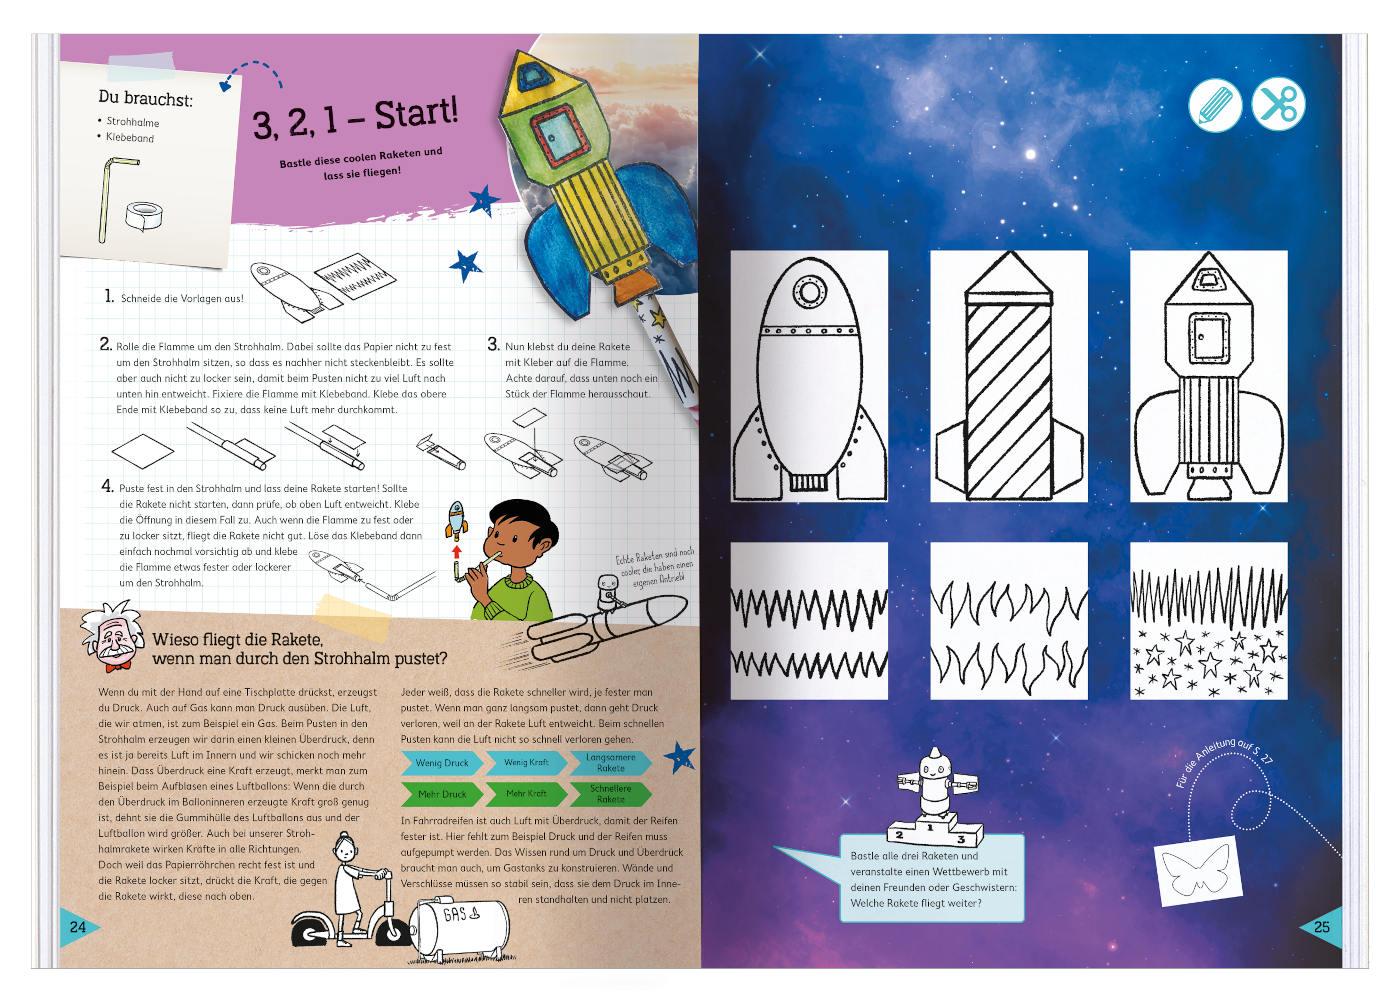 Das Physik-Bastelbuch: Raketen selber fliegen lassen